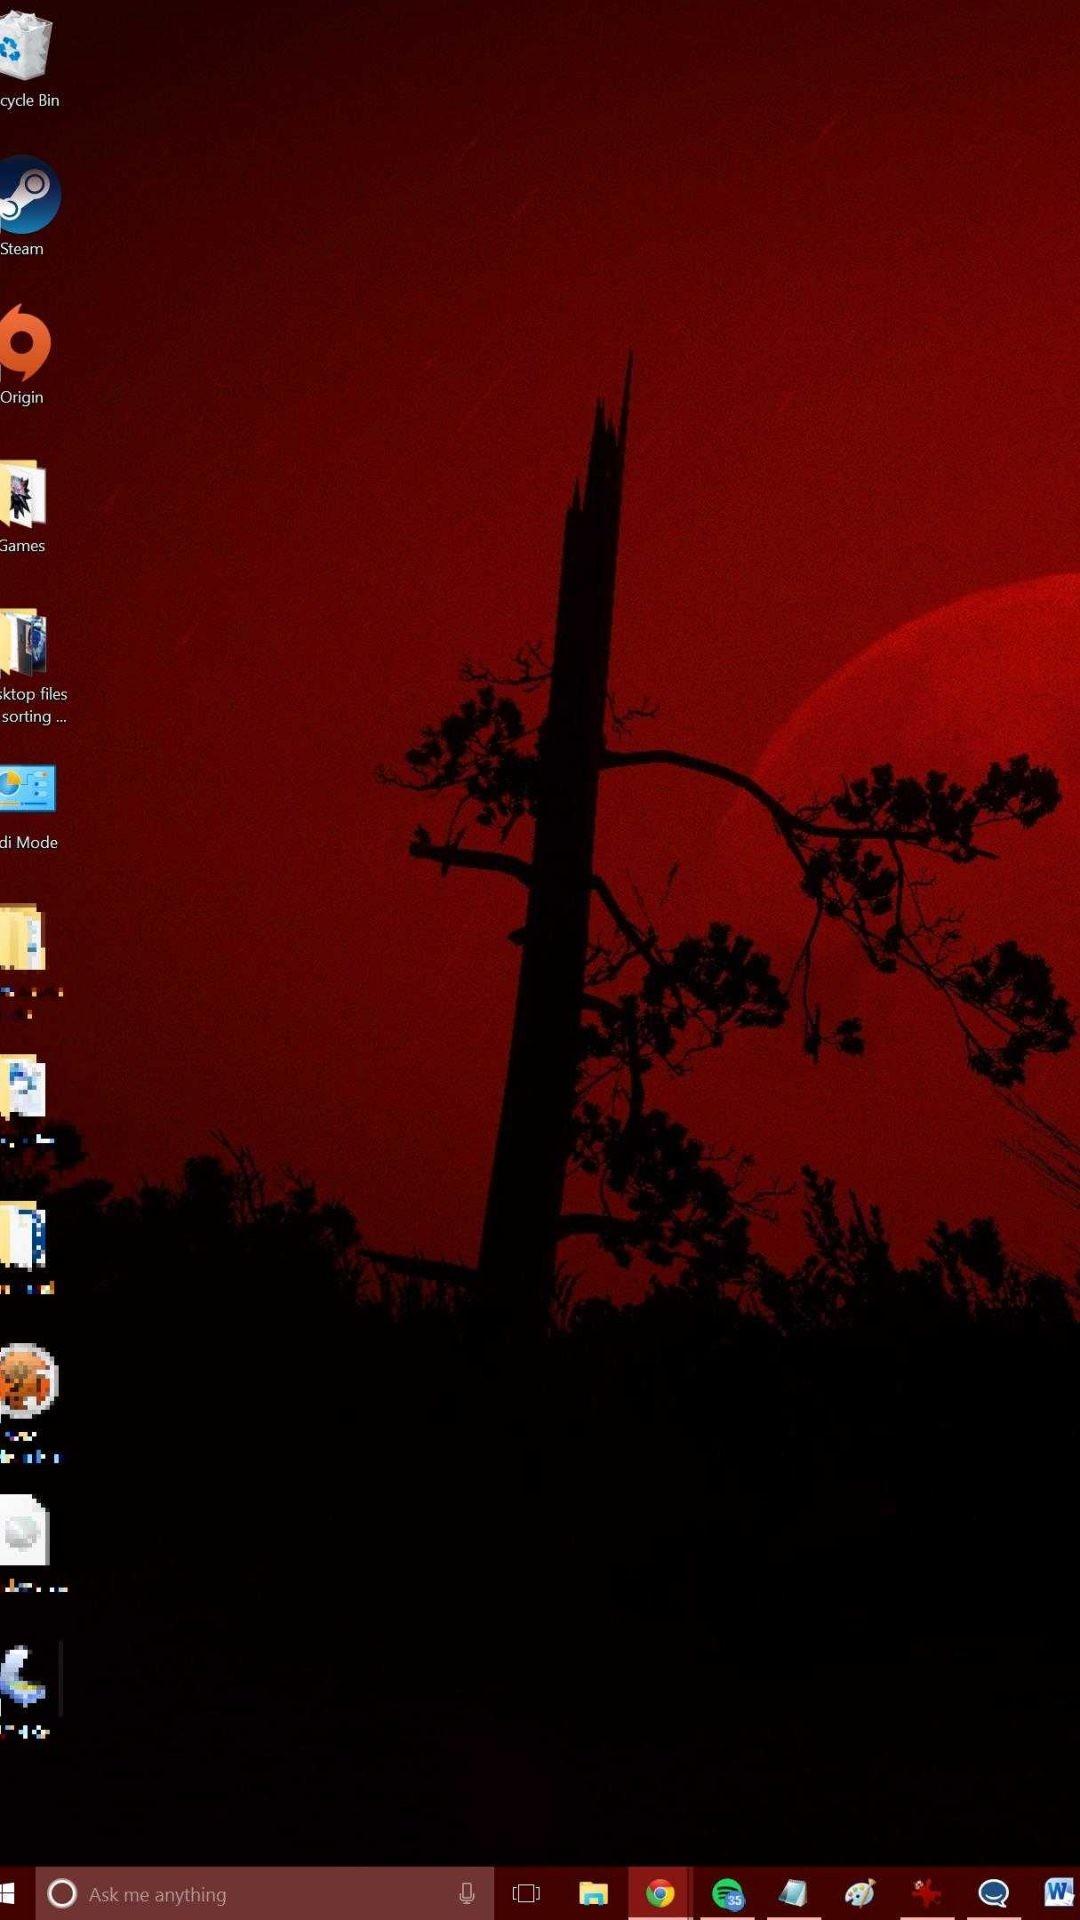 1080x1920 Dual Monitor Different Wallpaper Windows 10